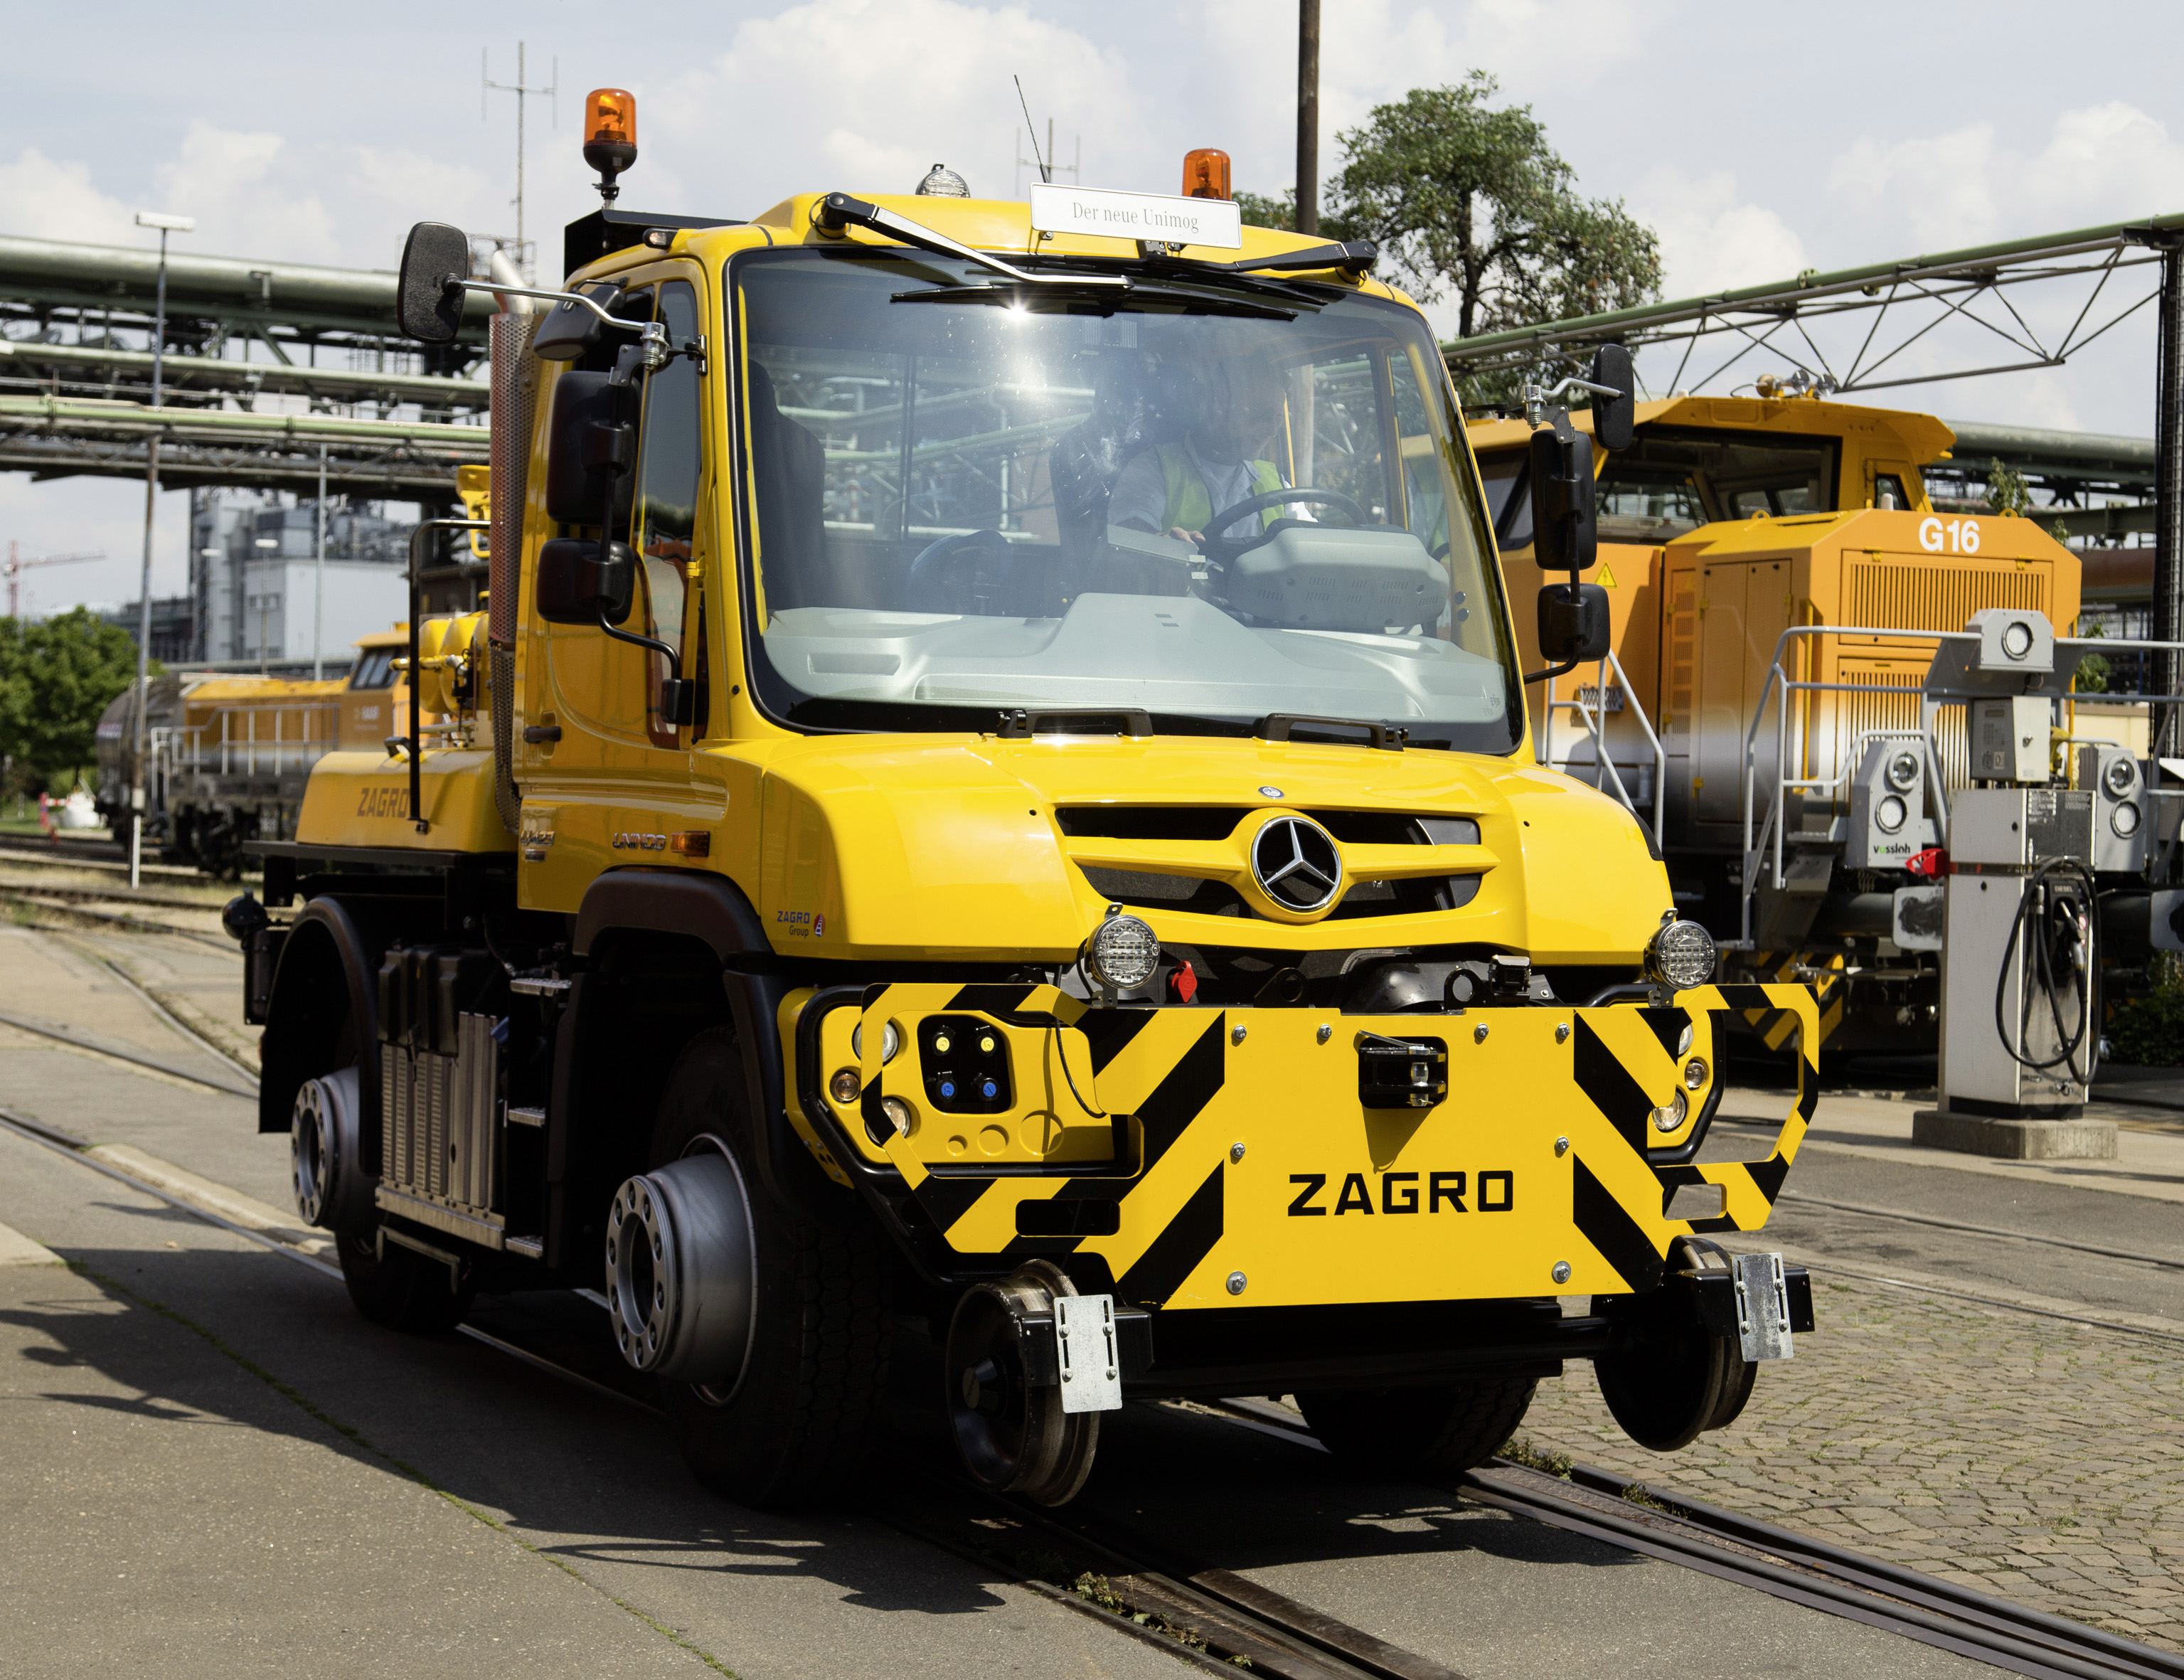 Mercedes Unimog Road Railer Goes From Truck To Diesel Locomotive Photo Gallery